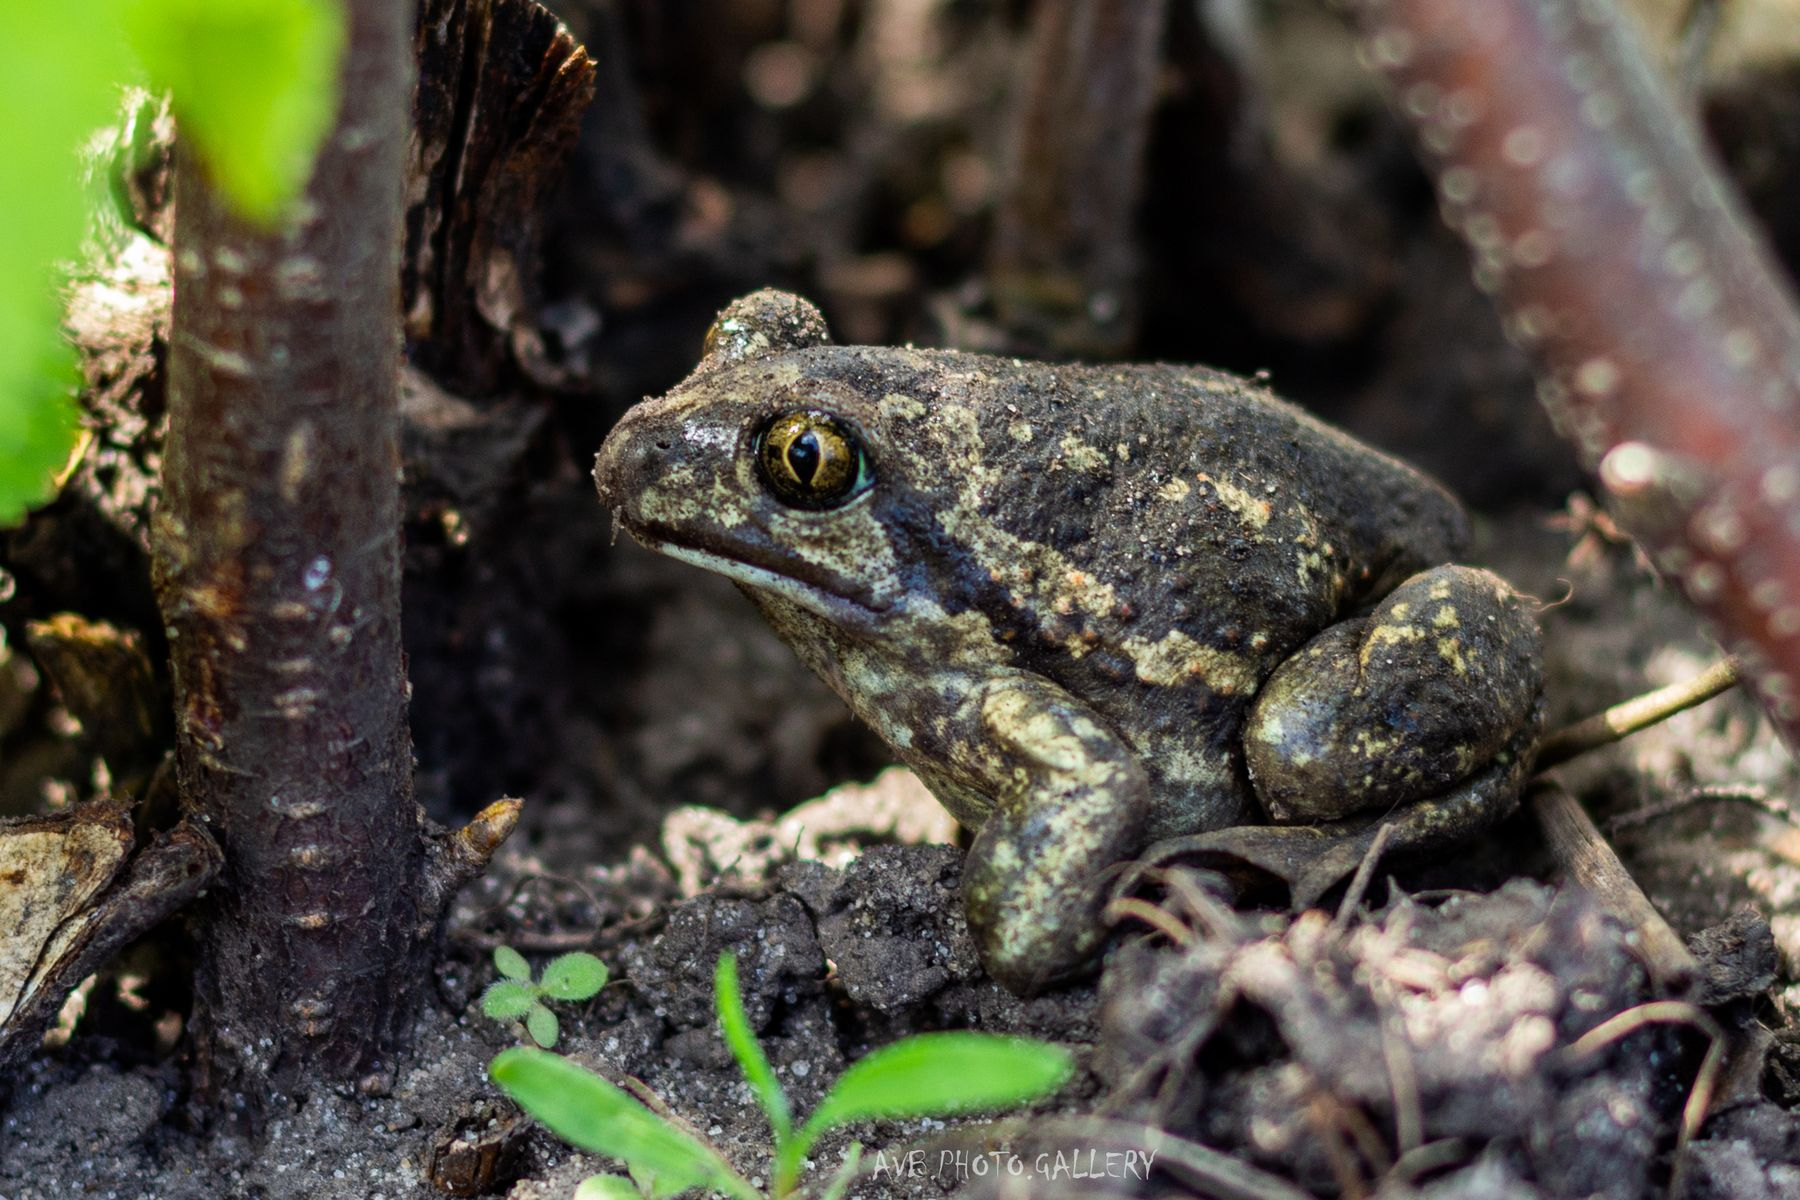 Земляная лягушка Лягушка земляная лягушка